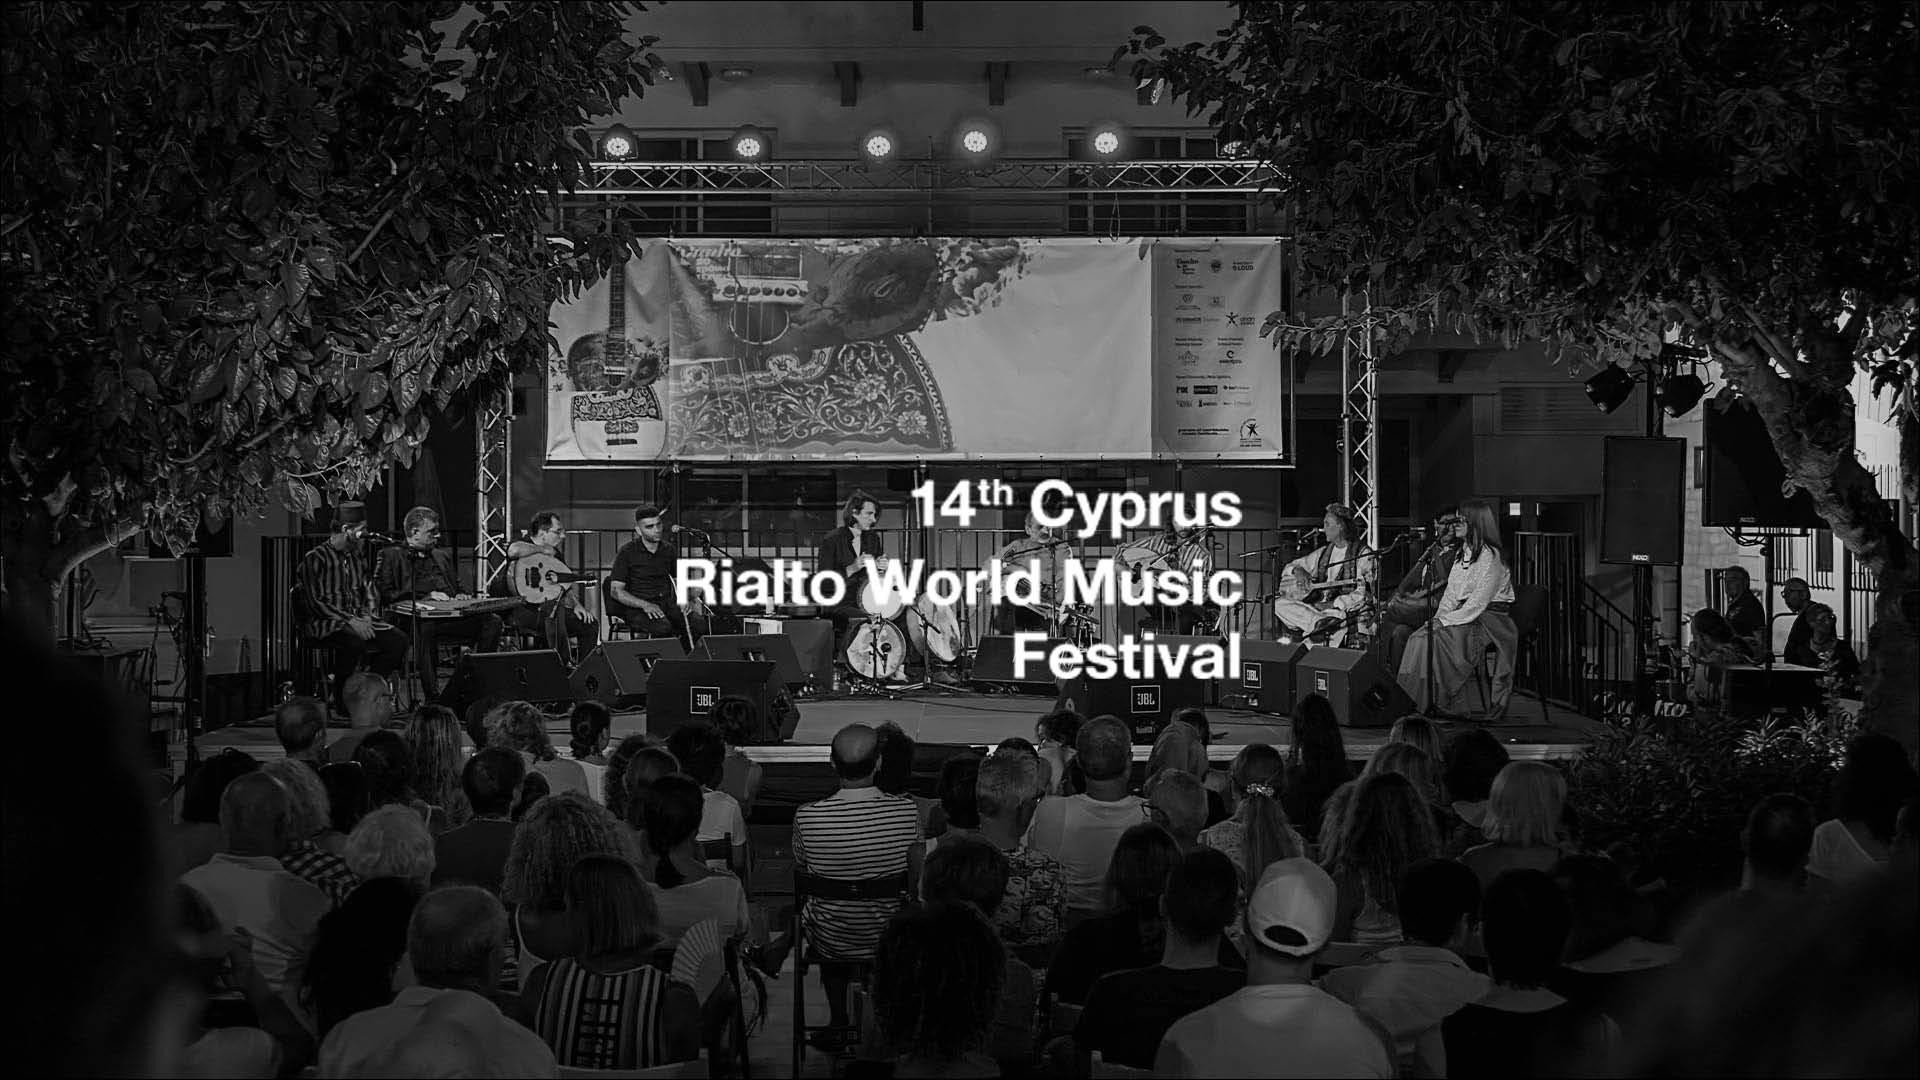 CYPRUS RIALTO WORLD MUSIC FESTIVAL